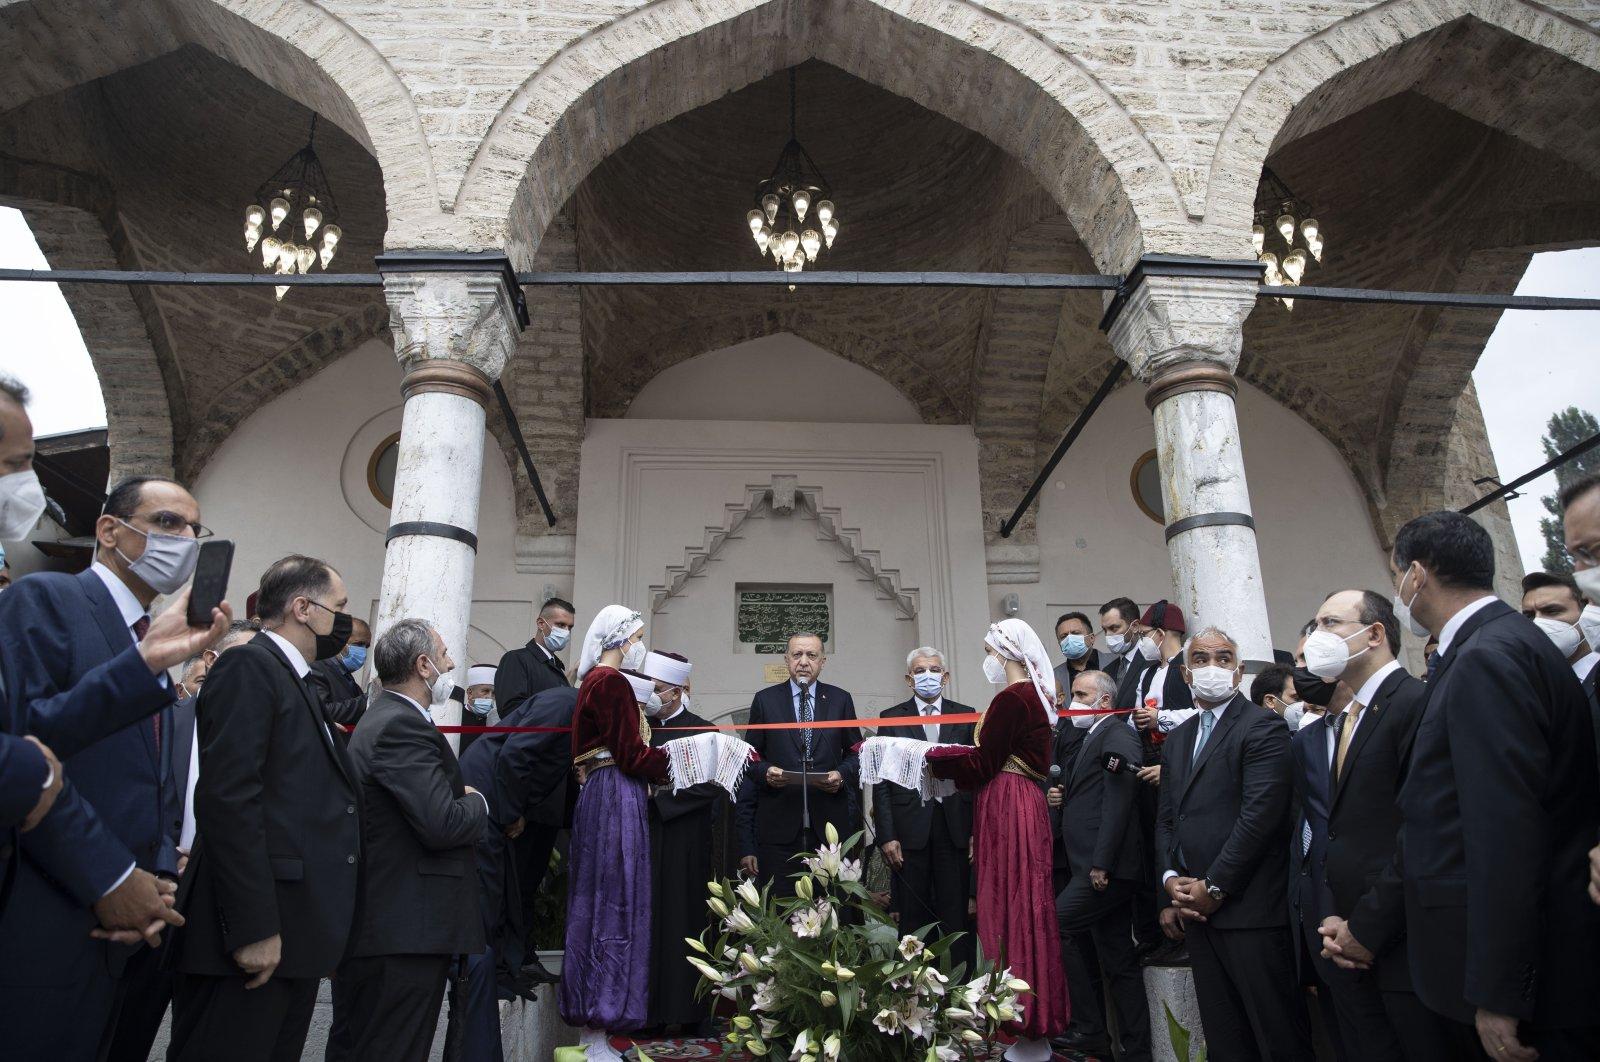 President Recep Tayyip Erdoğan attends the opening ceremony of the Bascarsija Mosque in Sarajevo, Bosnia-Herzegovina, Friday, Aug. 27, 2021. (AA Photo)